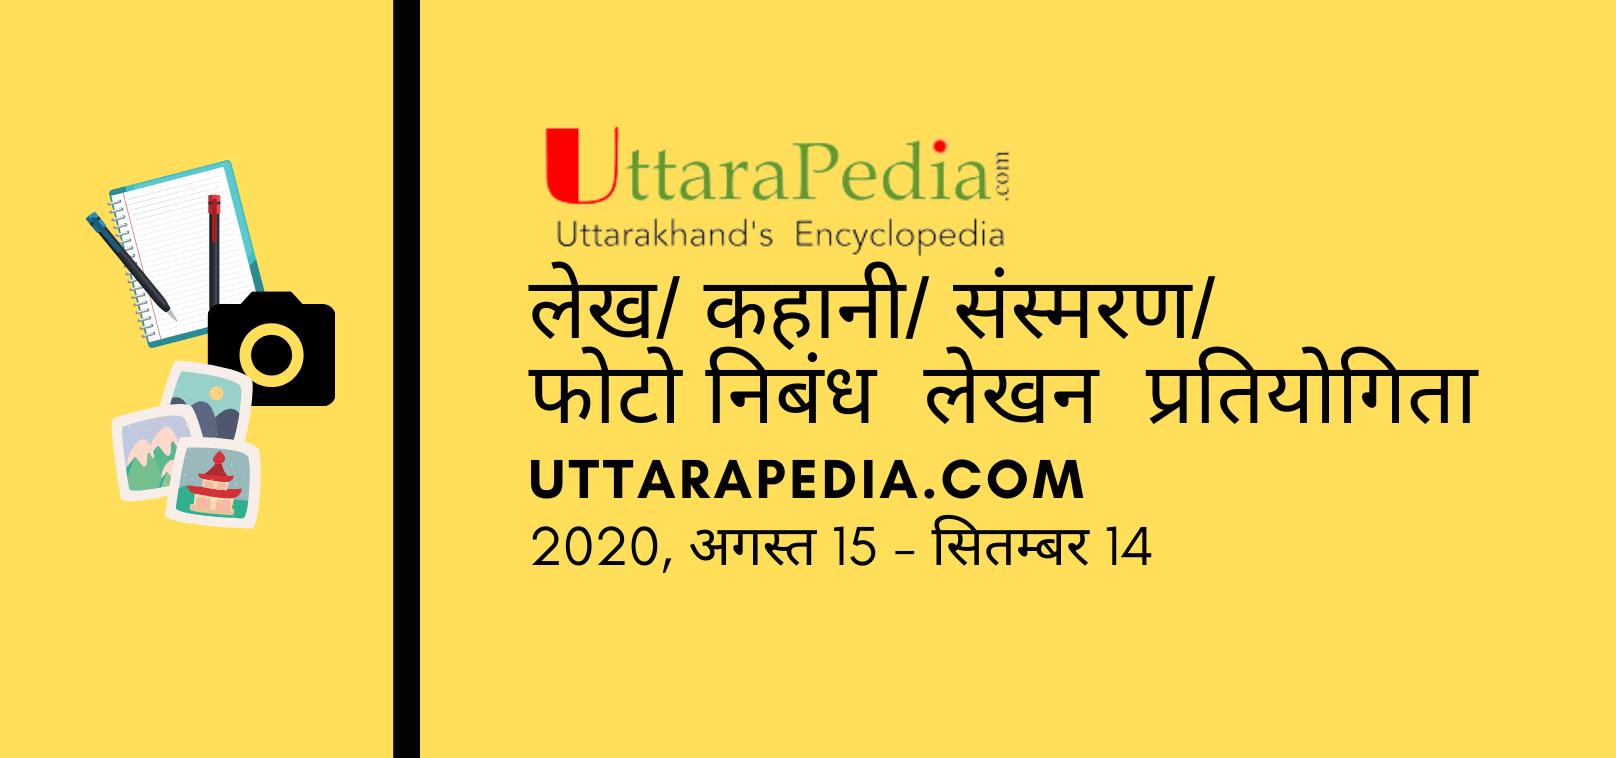 uttarapedia writng competition august 2020